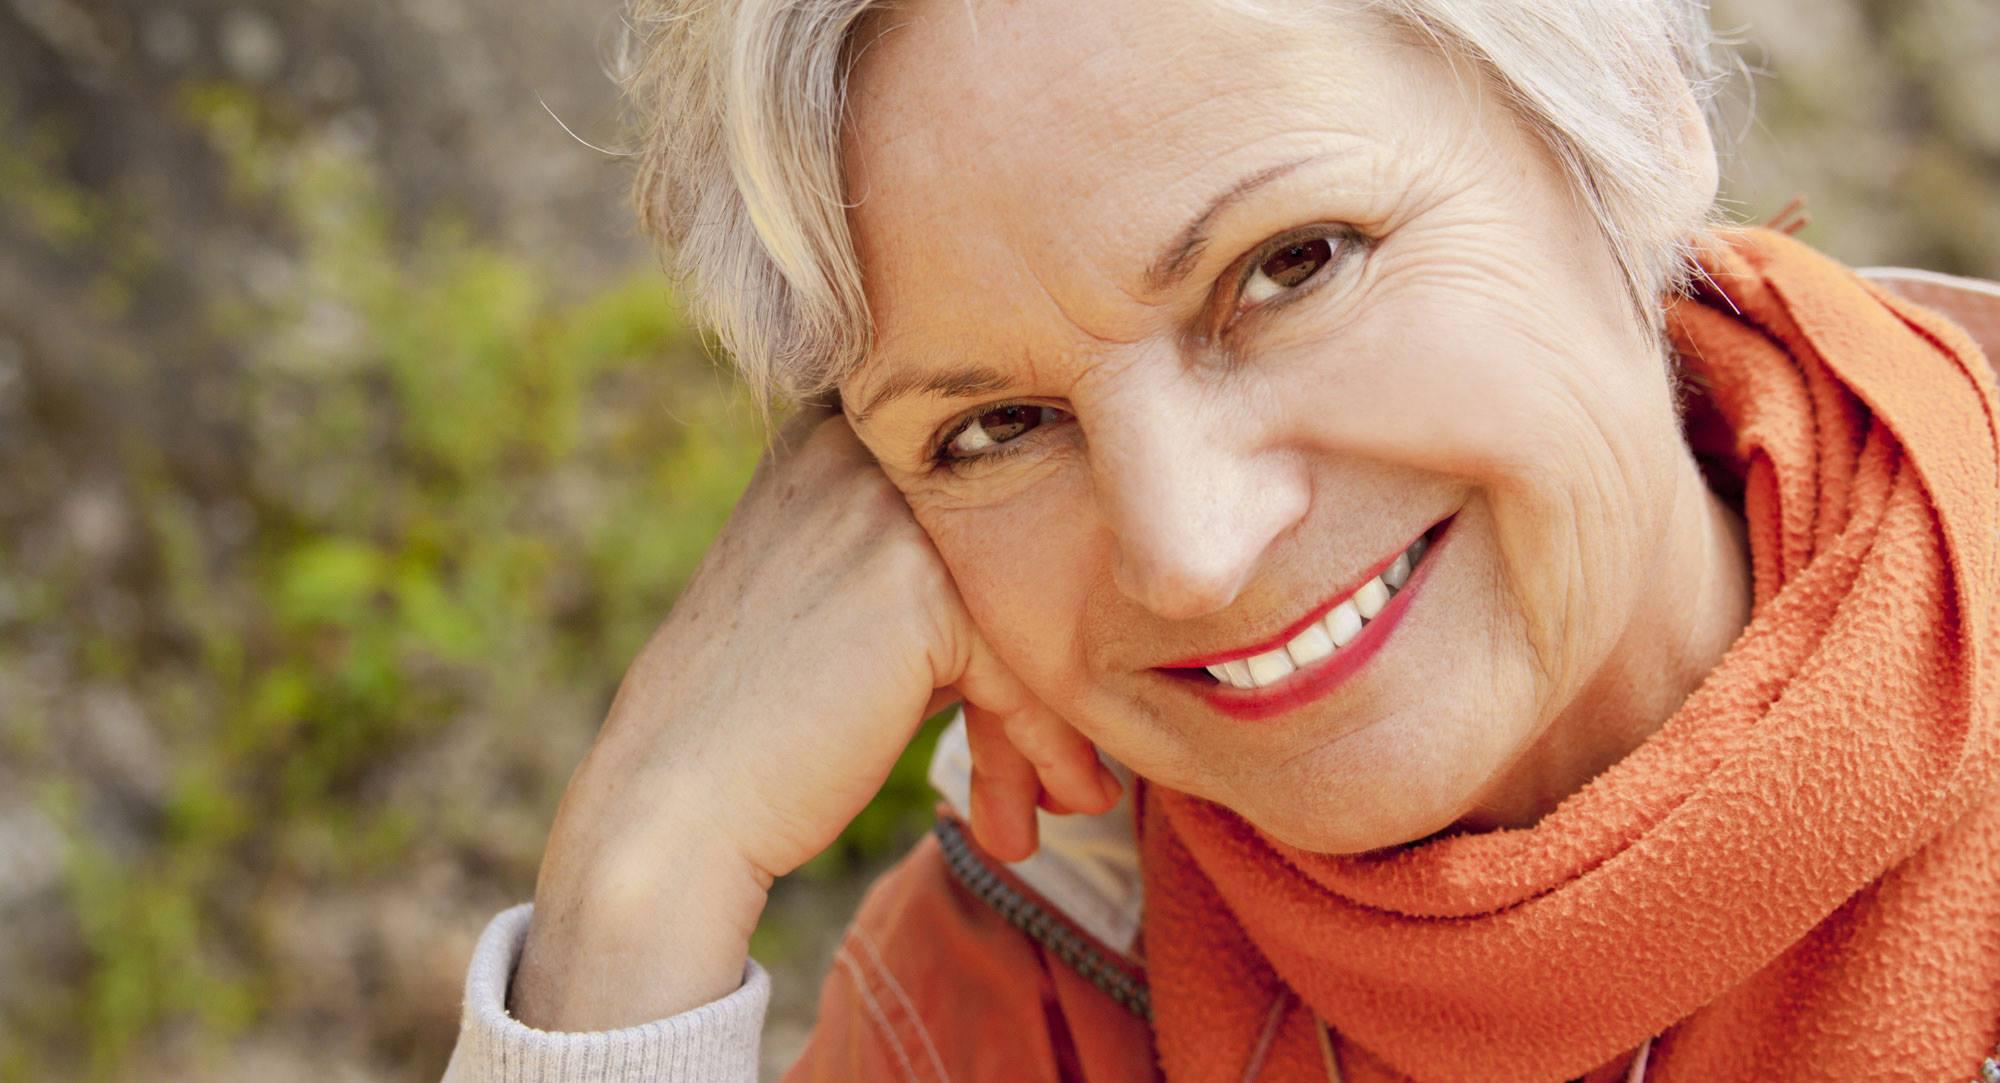 OLDER WOMAN SMILING DENTURES FAMILY DENTAL CENTRES